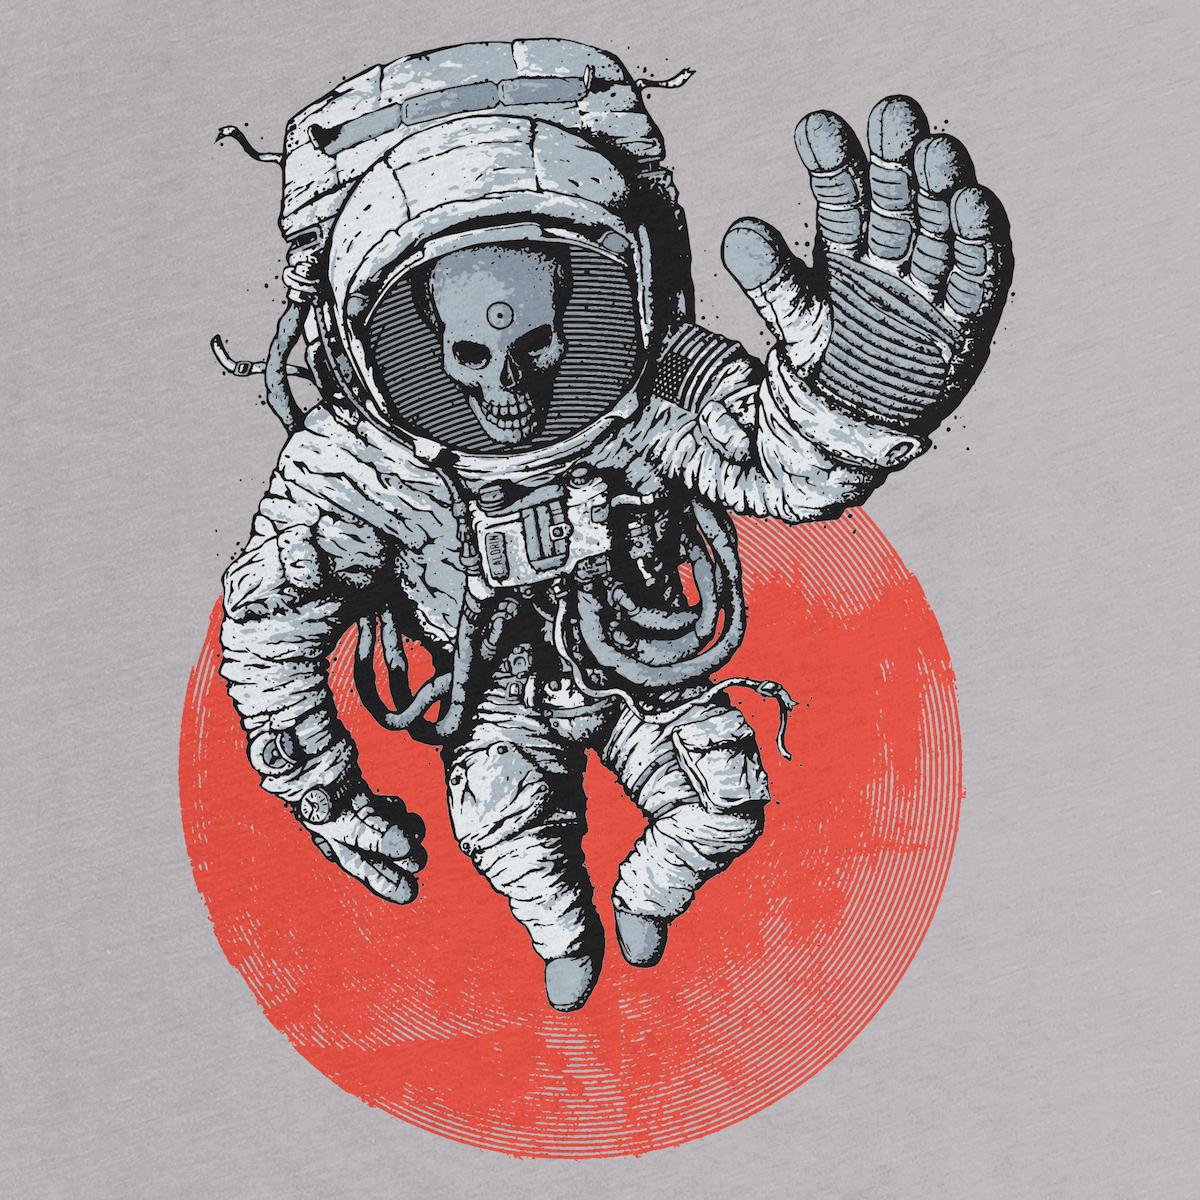 dead astronauts remains - HD1200×1200